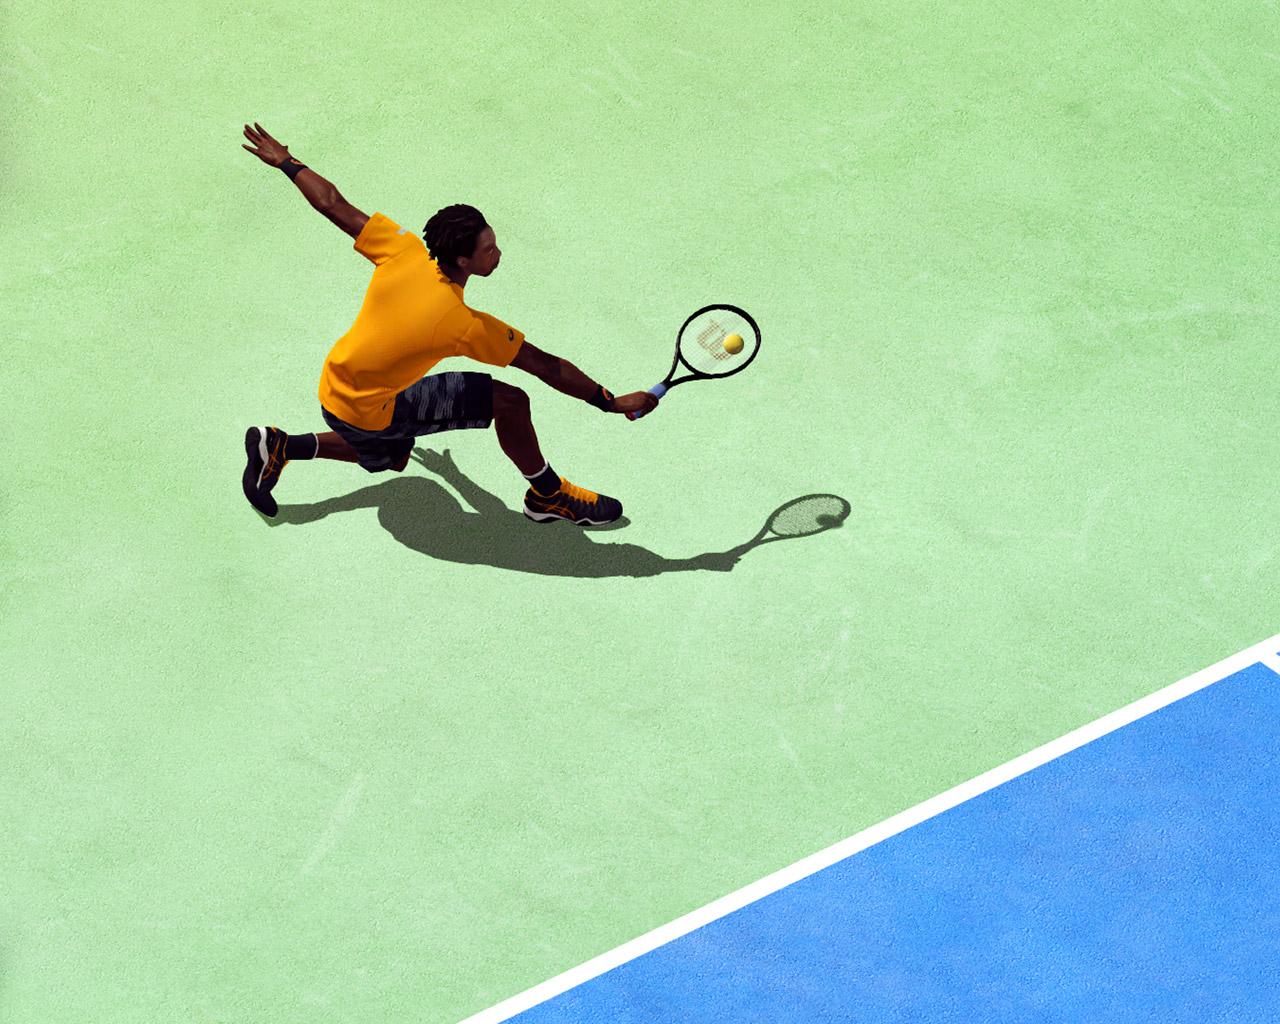 Tennis World Tour Wallpaper in 1280x1024